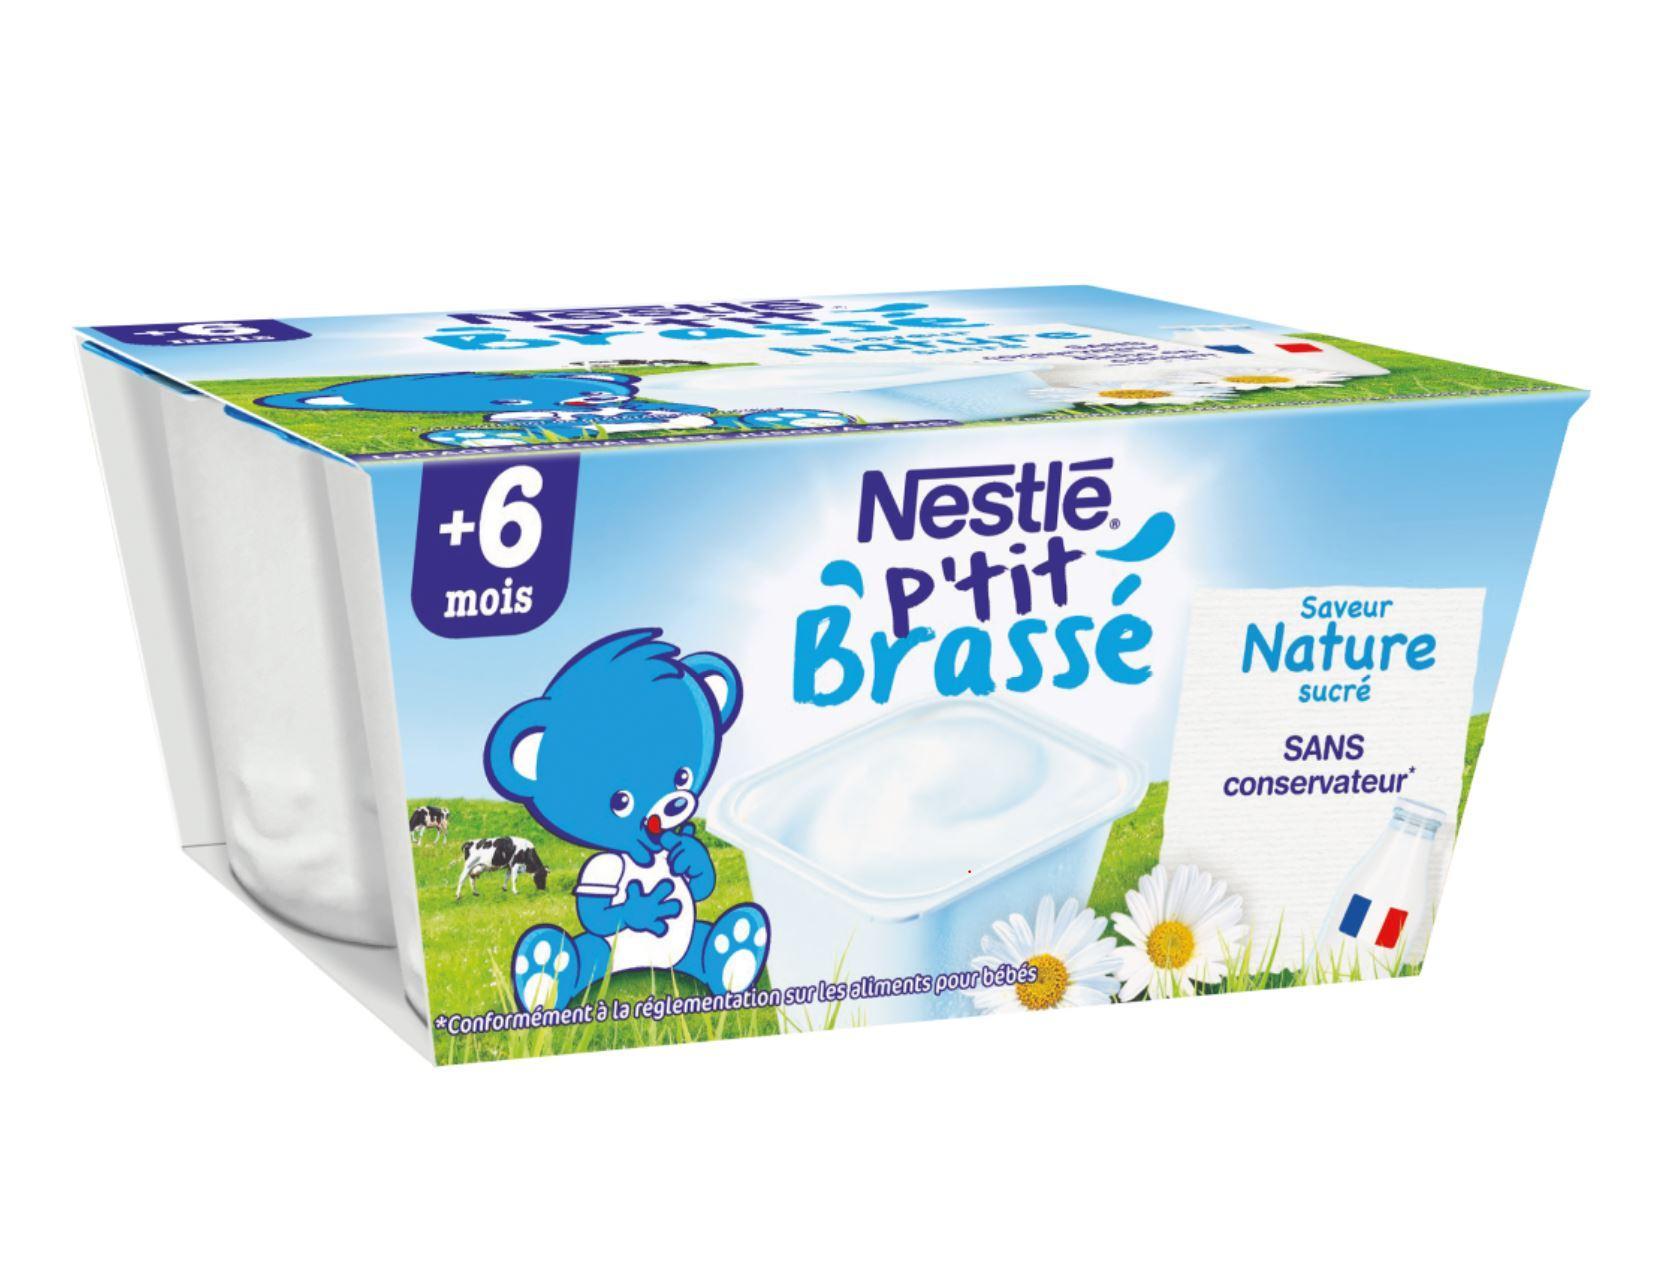 P'tit Brassé Nature (4x100g) NESTLÉ